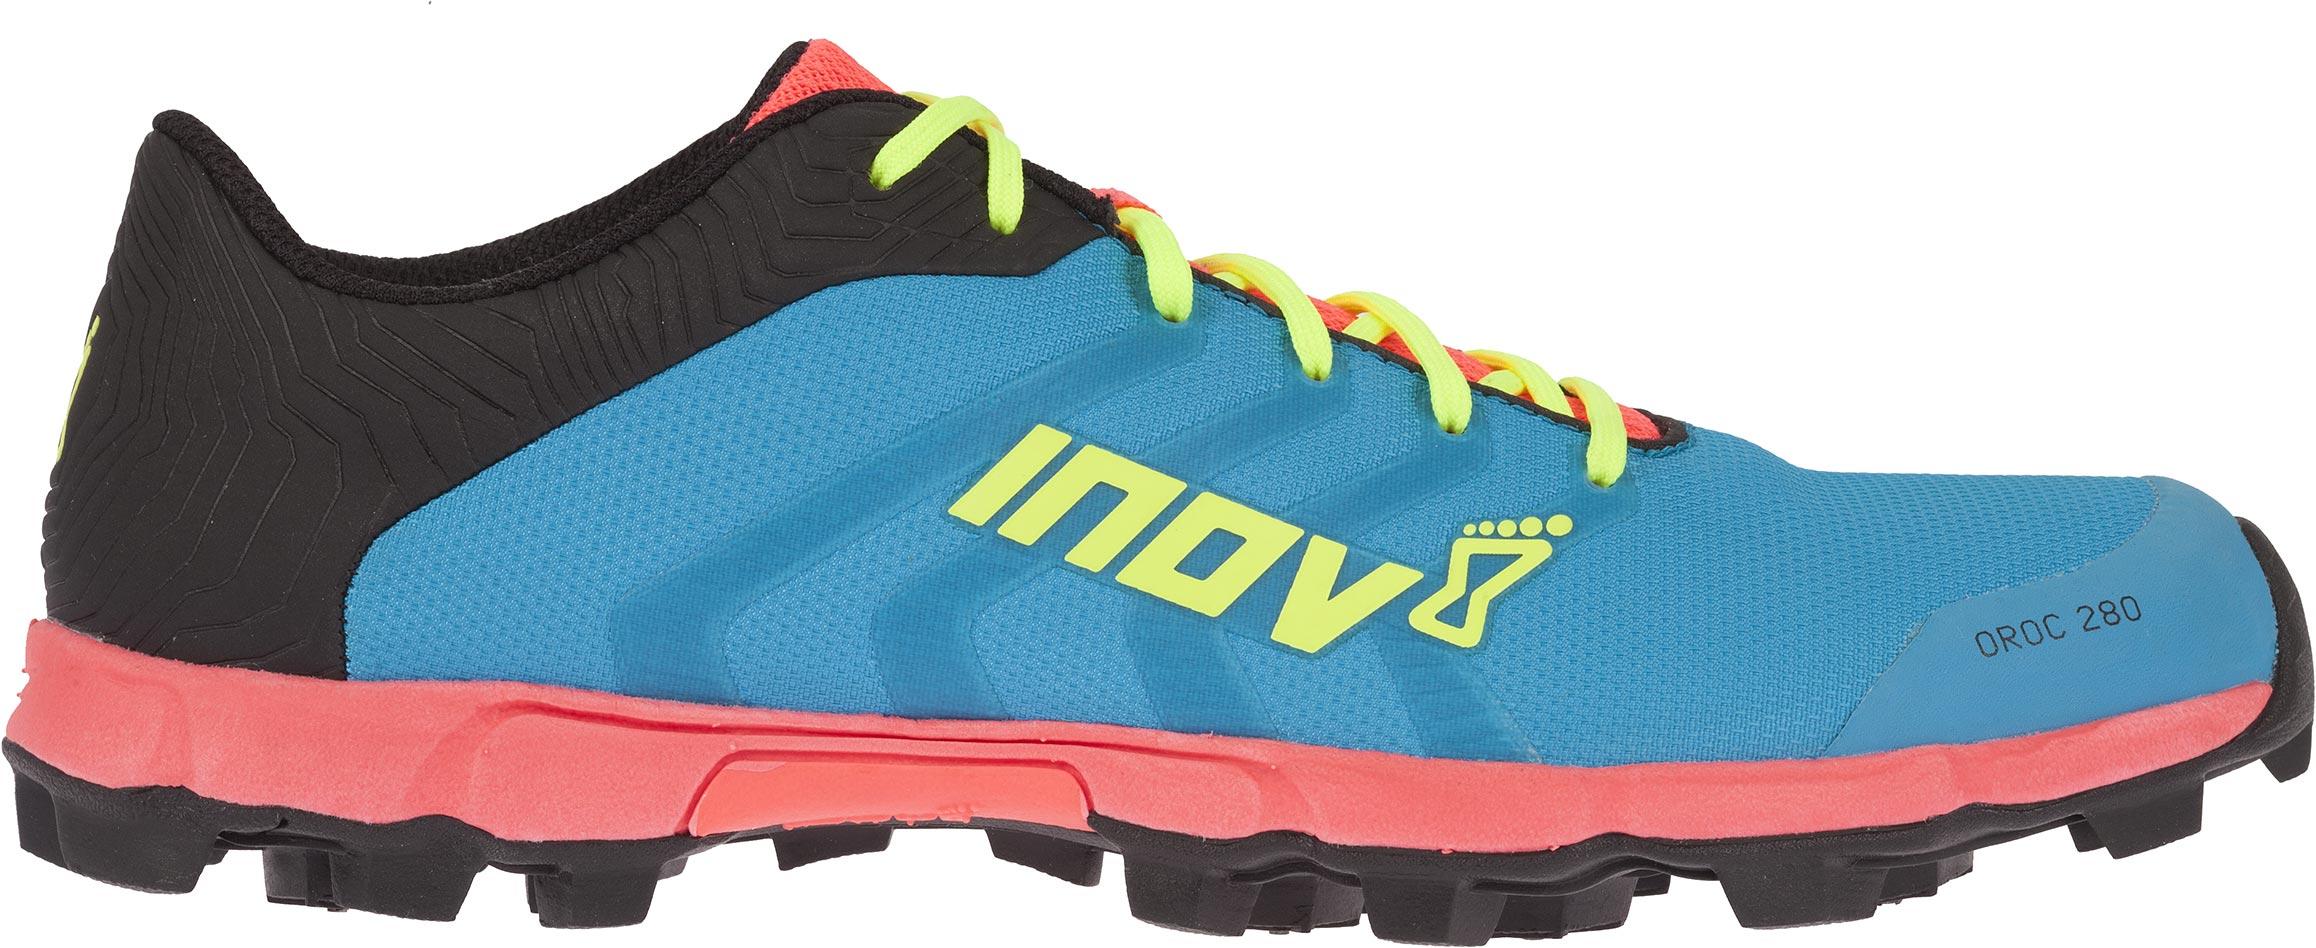 Inov-8 Oroc 280 v2 blue/pink/yellow 42